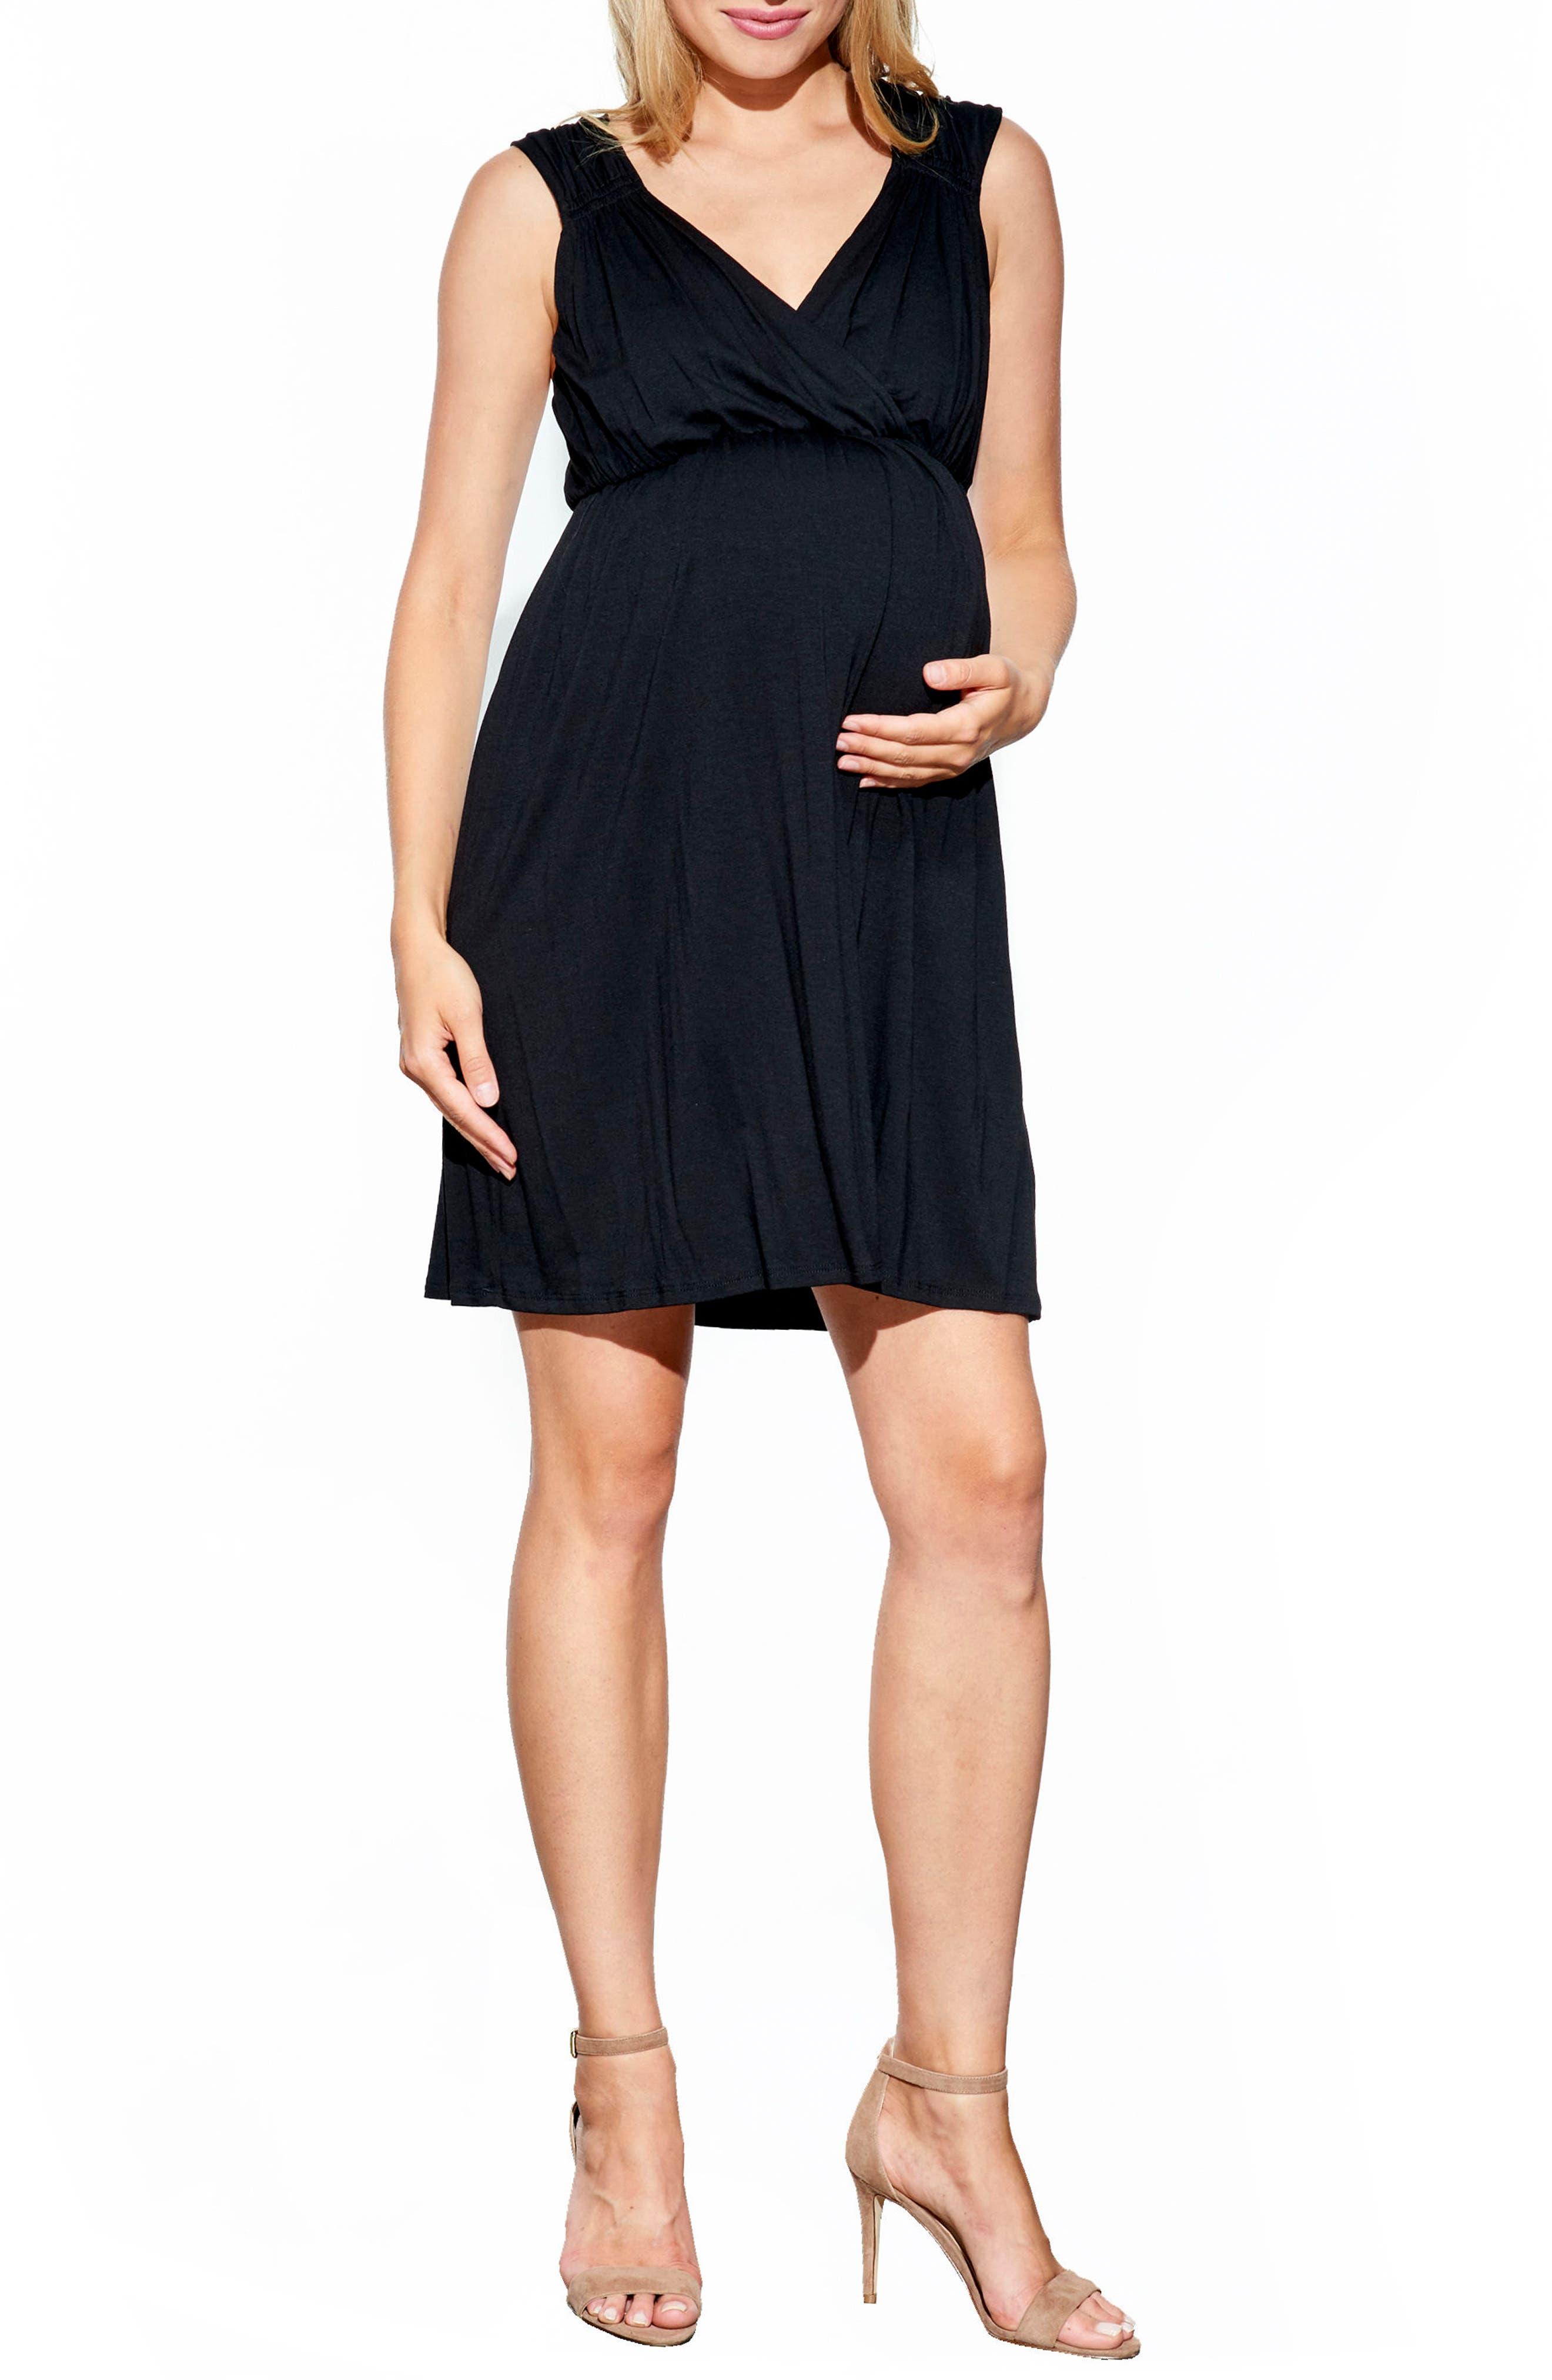 'Vanessa' Maternity Dress,                         Main,                         color, Black